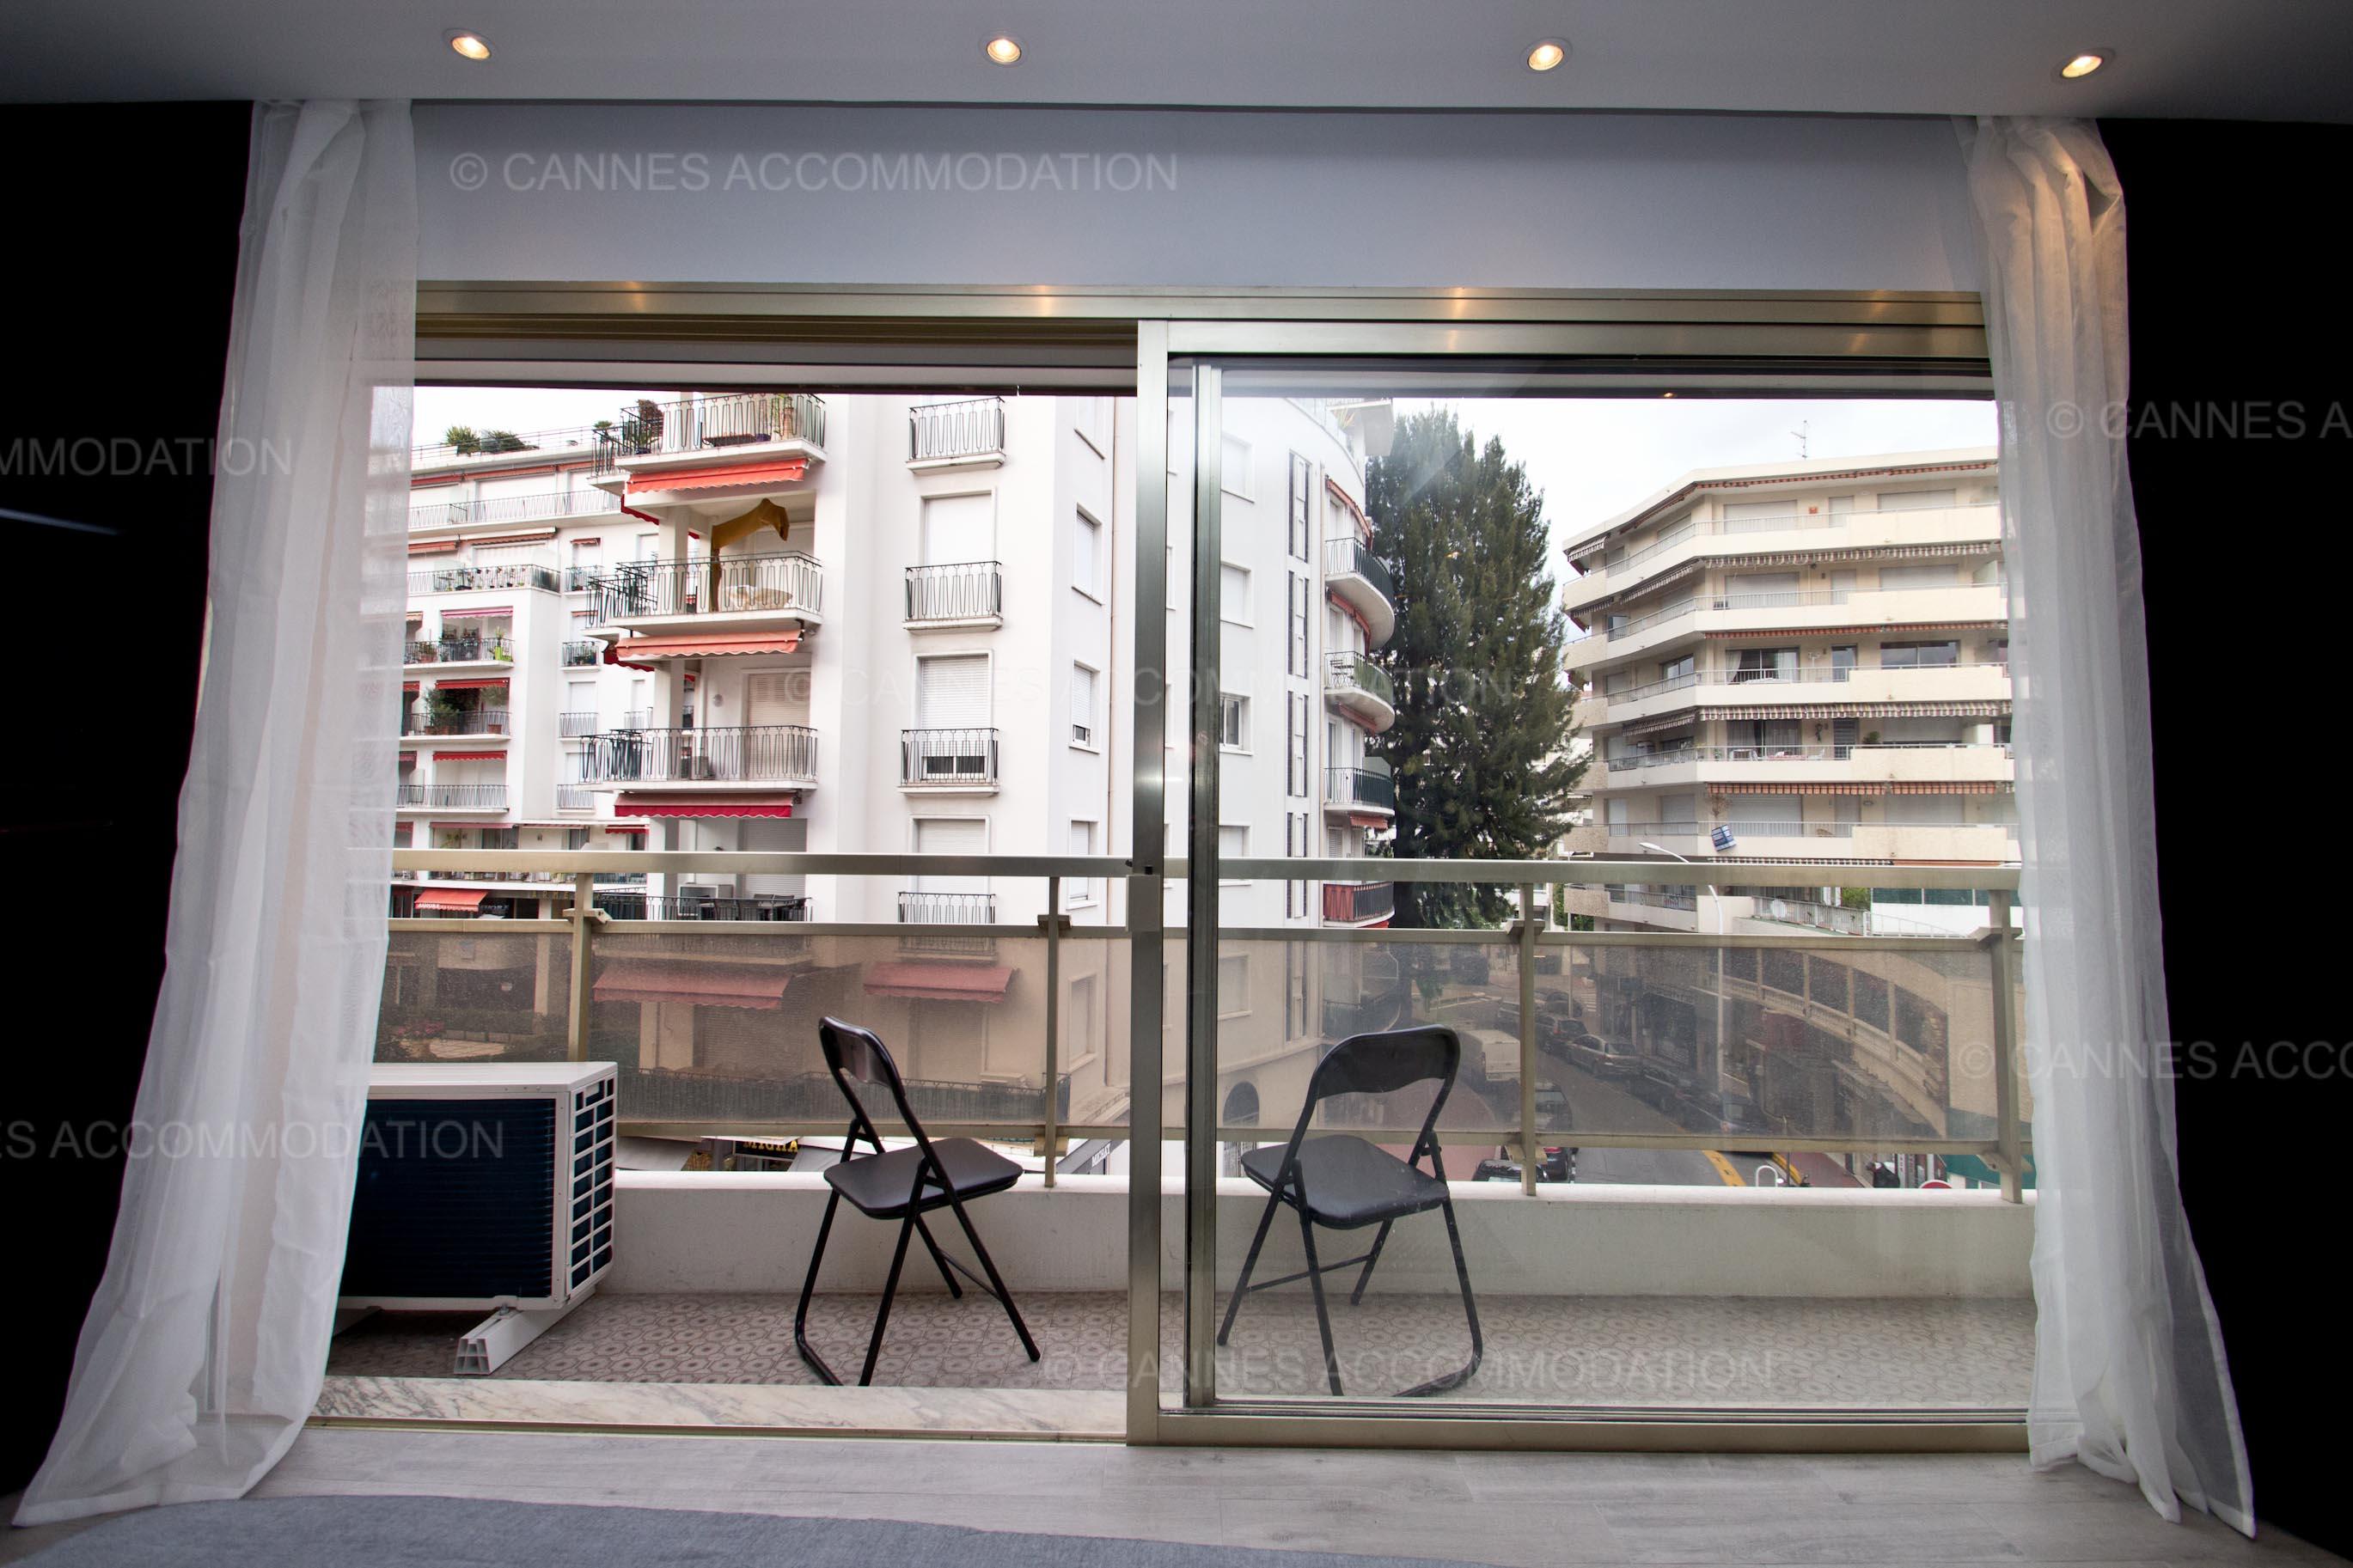 studio louer cannes grand hotel paris cannes accommodation. Black Bedroom Furniture Sets. Home Design Ideas